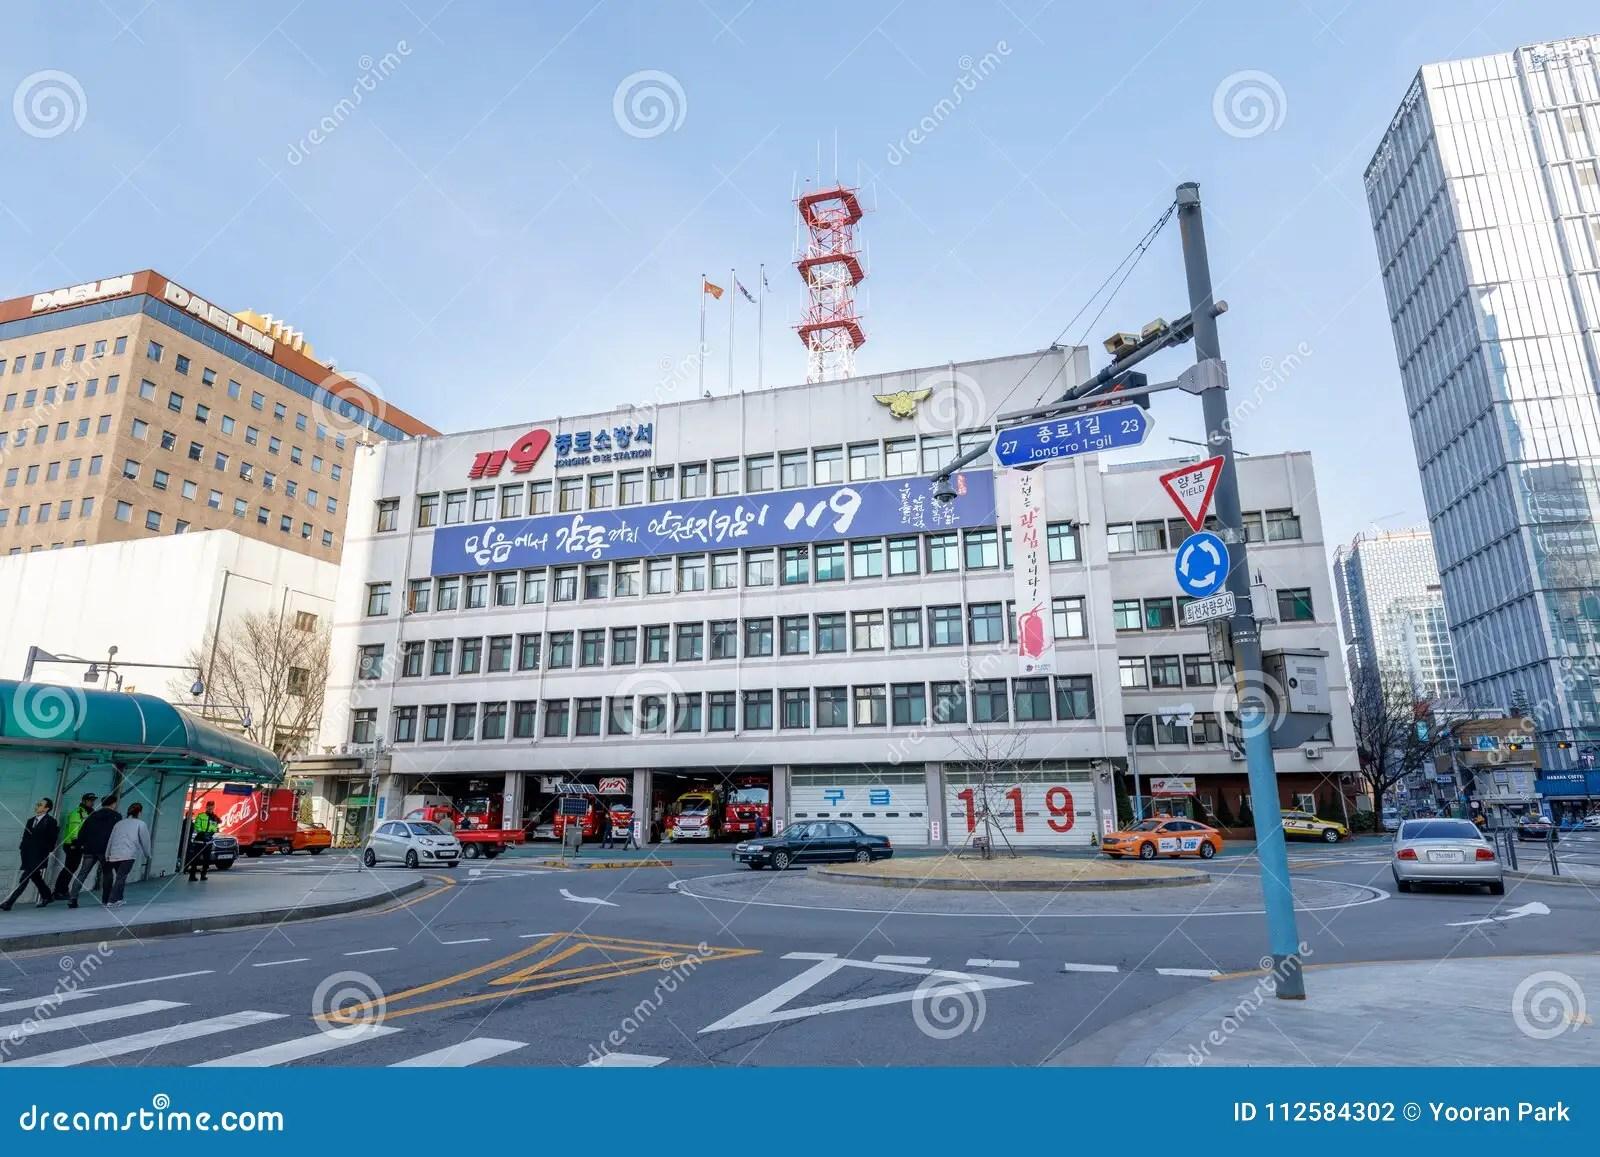 Building Of Seoul Jongno Fire Station In Jong Ro District